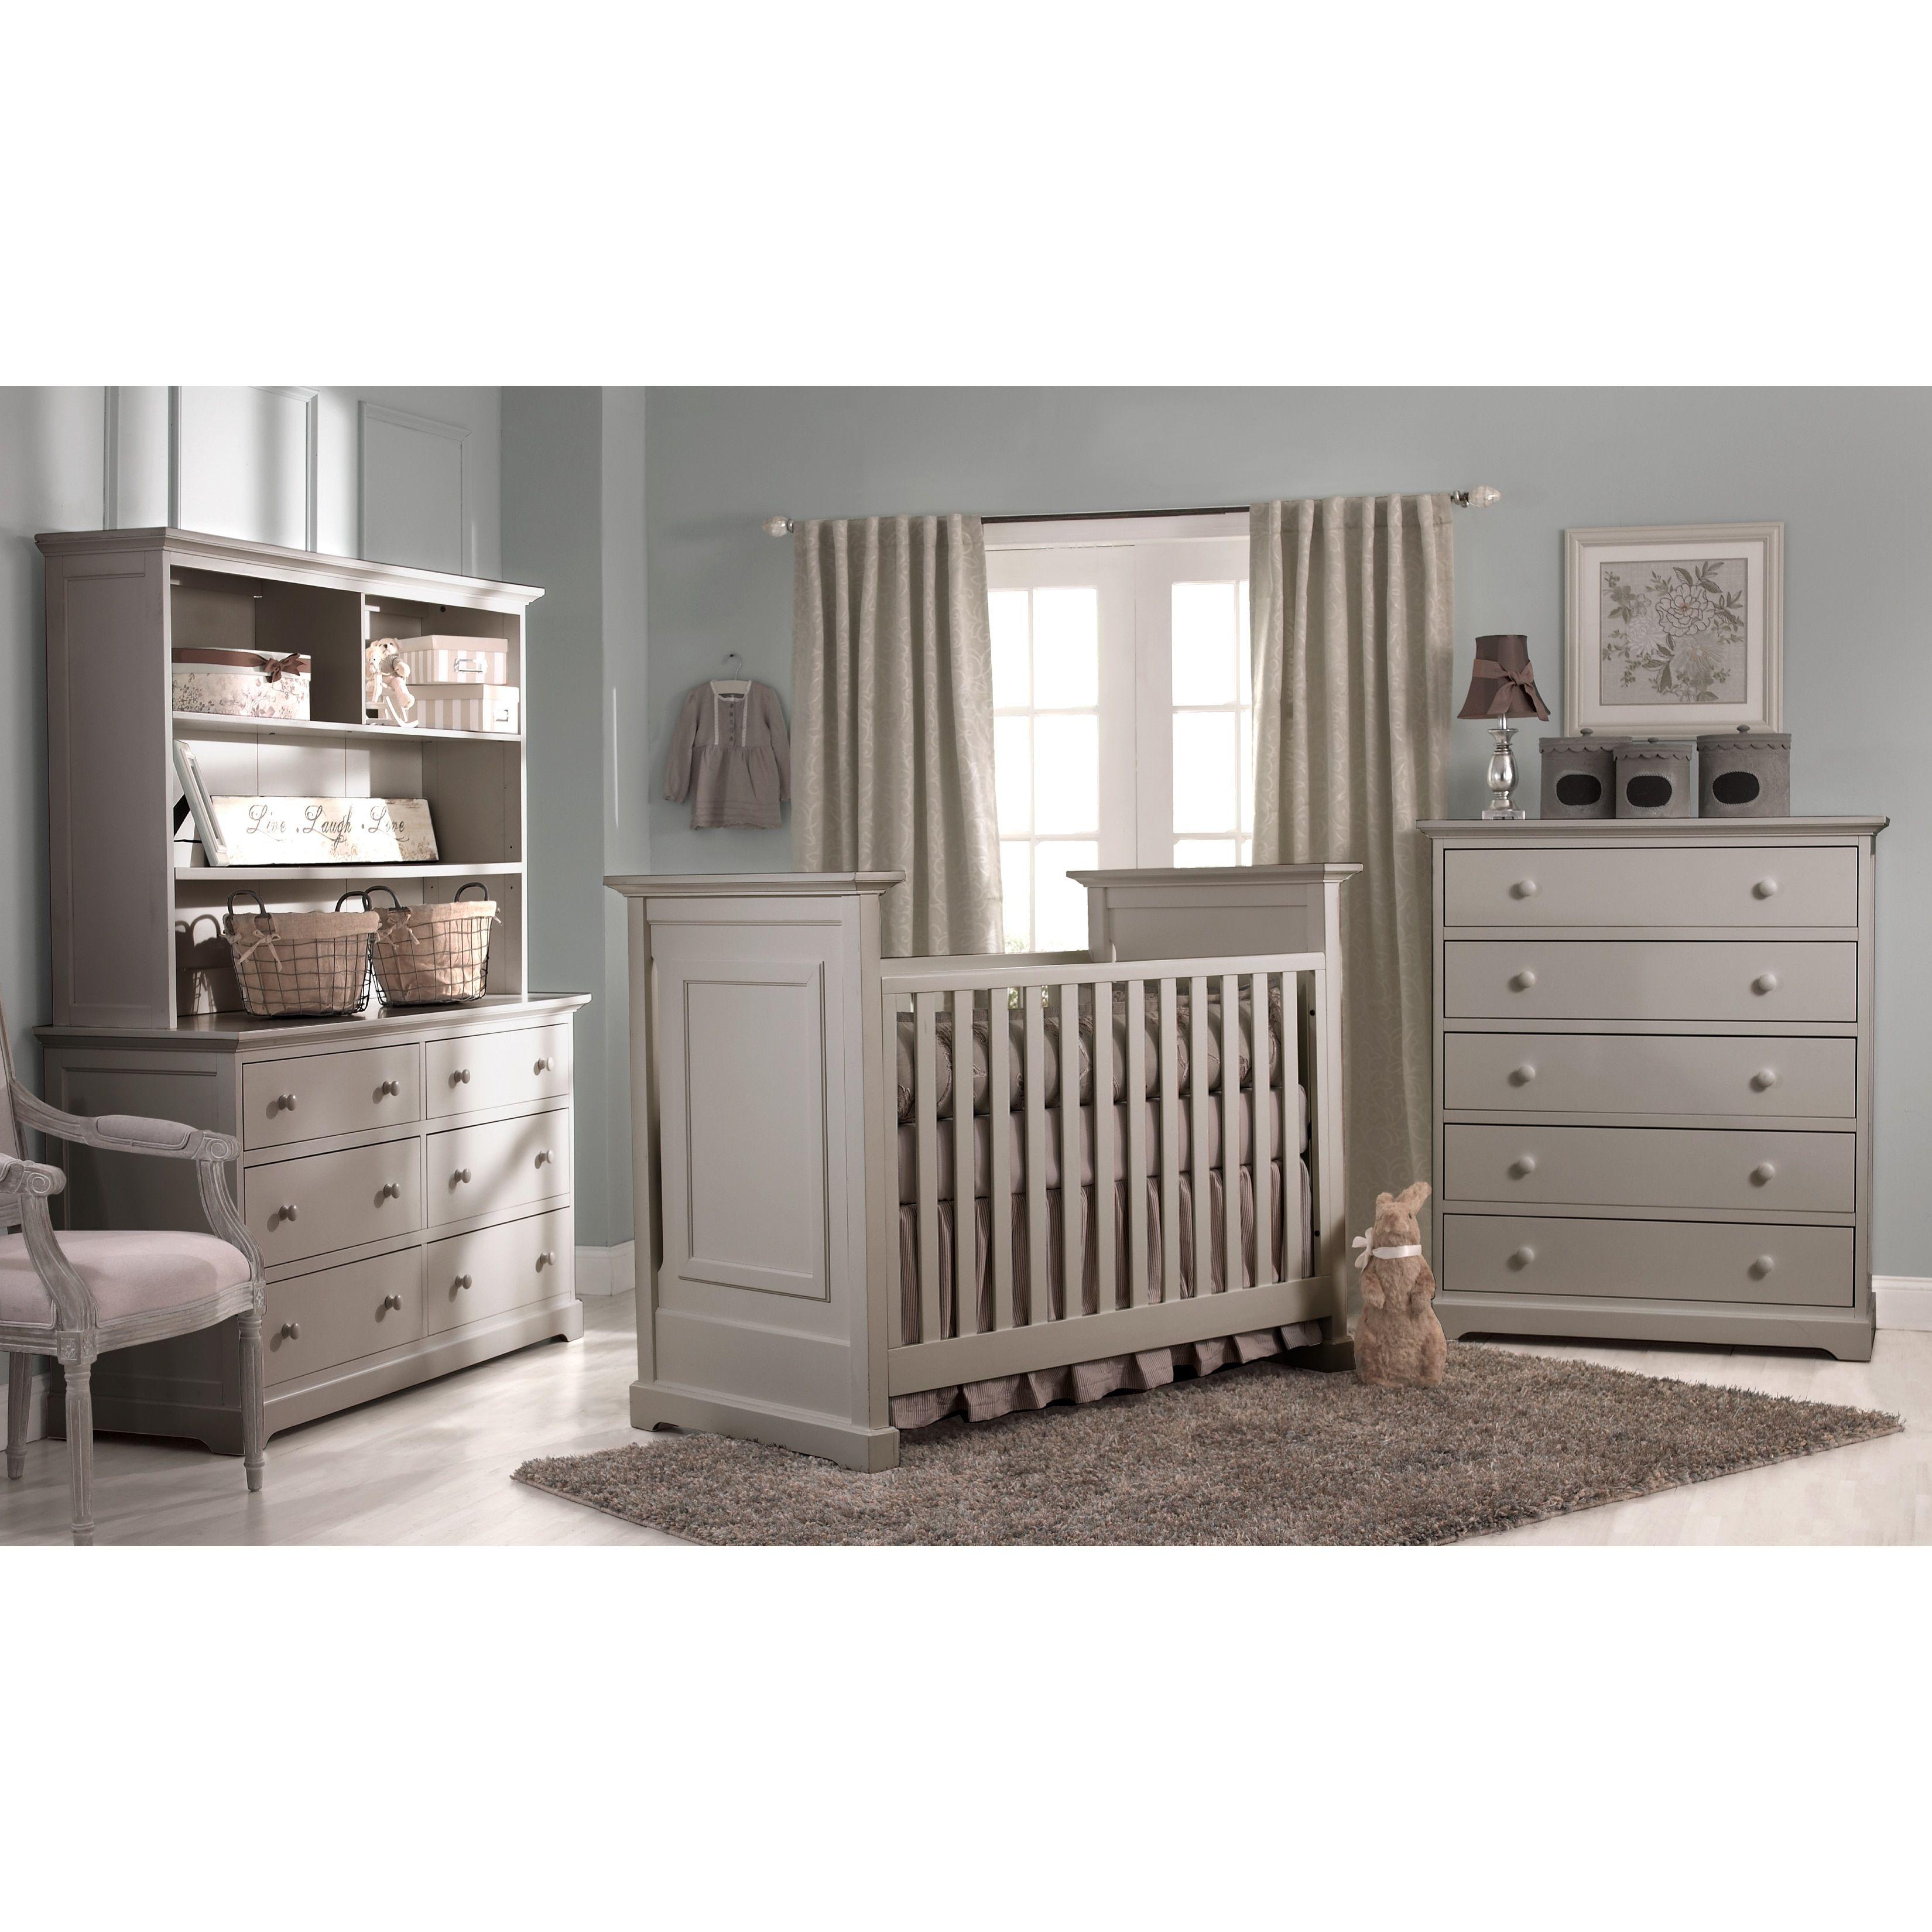 Heritage Centennial Chesapeake Clic 3 In 1 Crib Light Grey